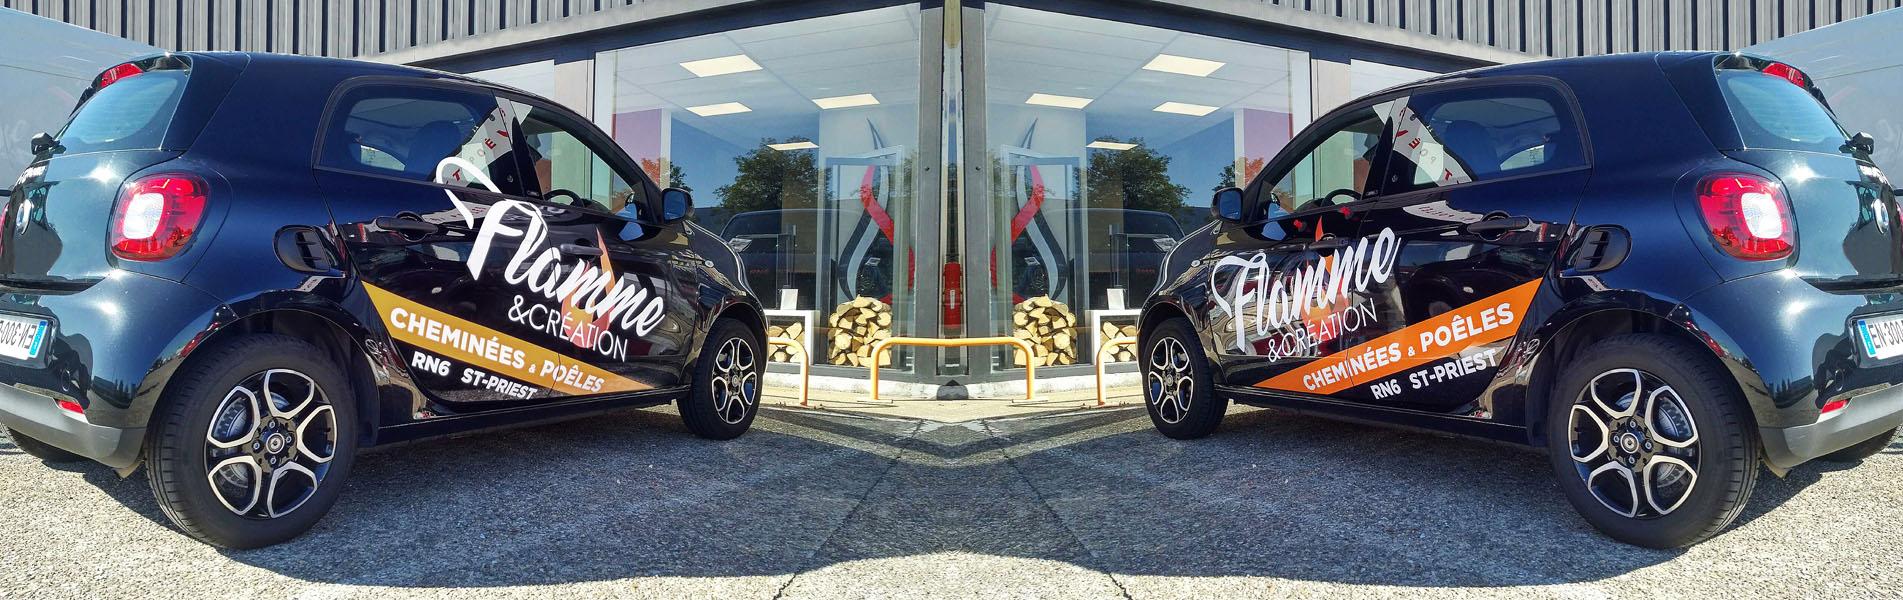 Adhesivage-vehicule-professionnel-marquage-publicitaire